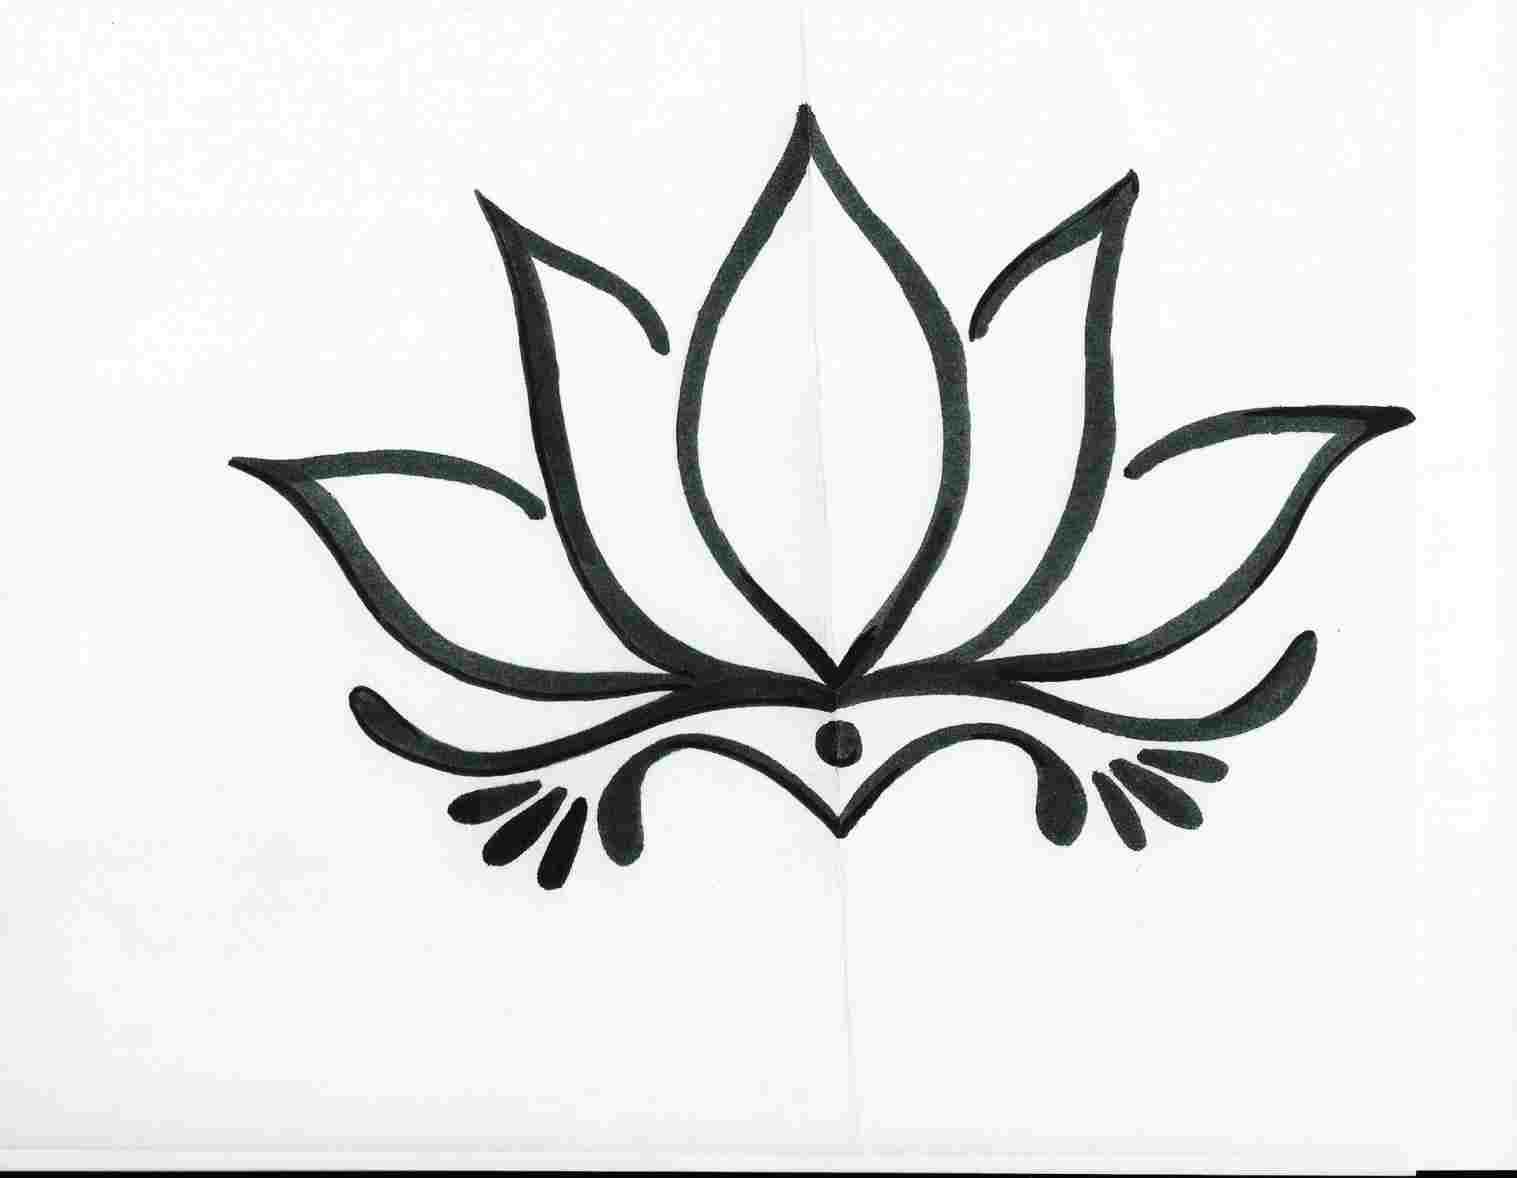 Mandala Flower Drawing | Free download best Mandala Flower